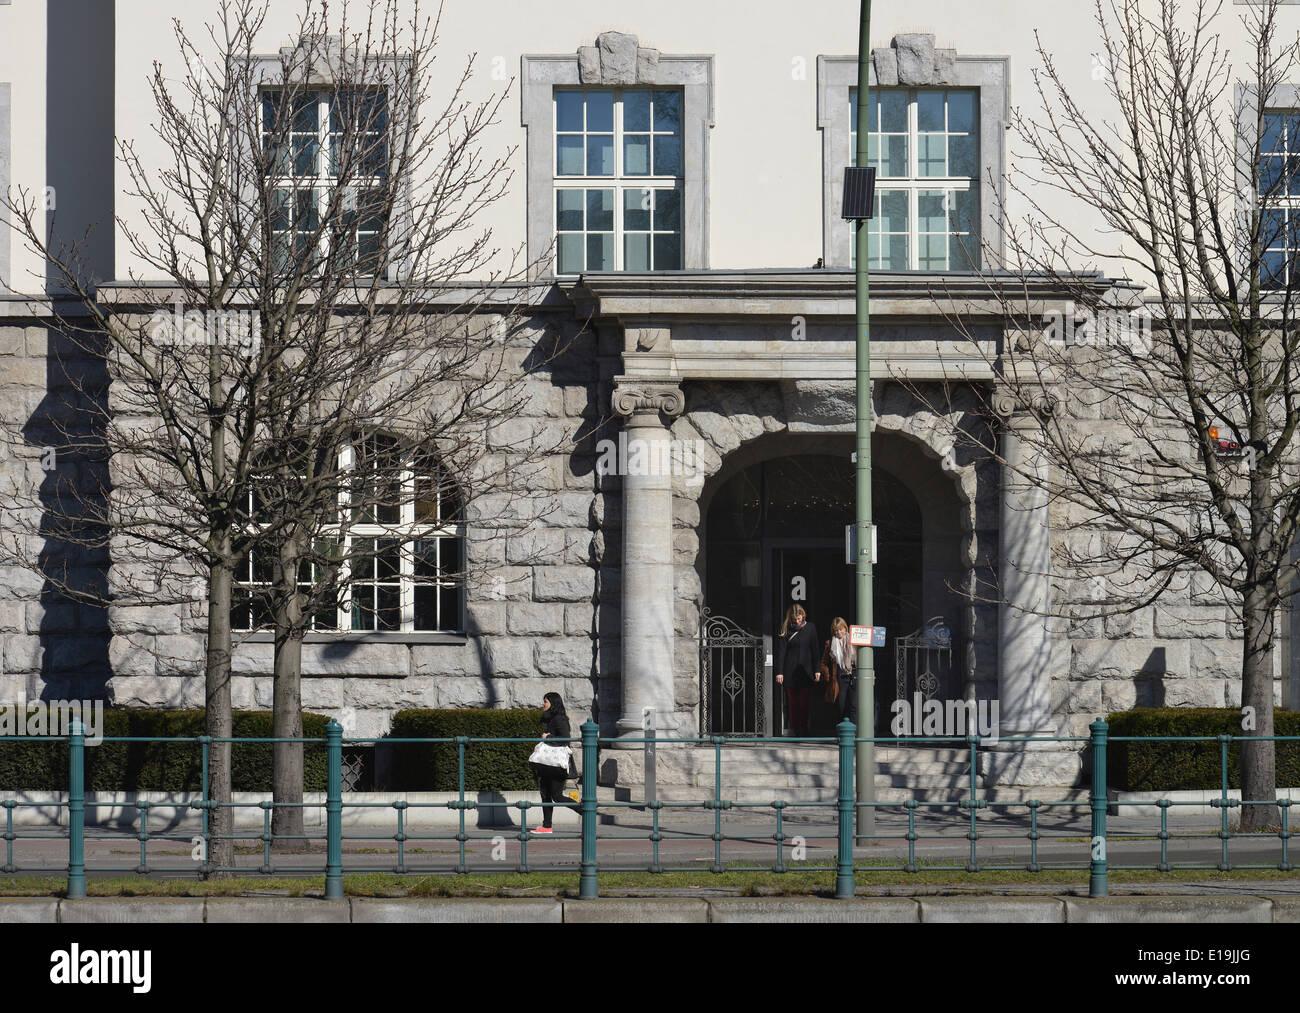 GIZ-Haus, Reichpietschufer, Tiergarten, Berlin, Deutschland - Stock Image